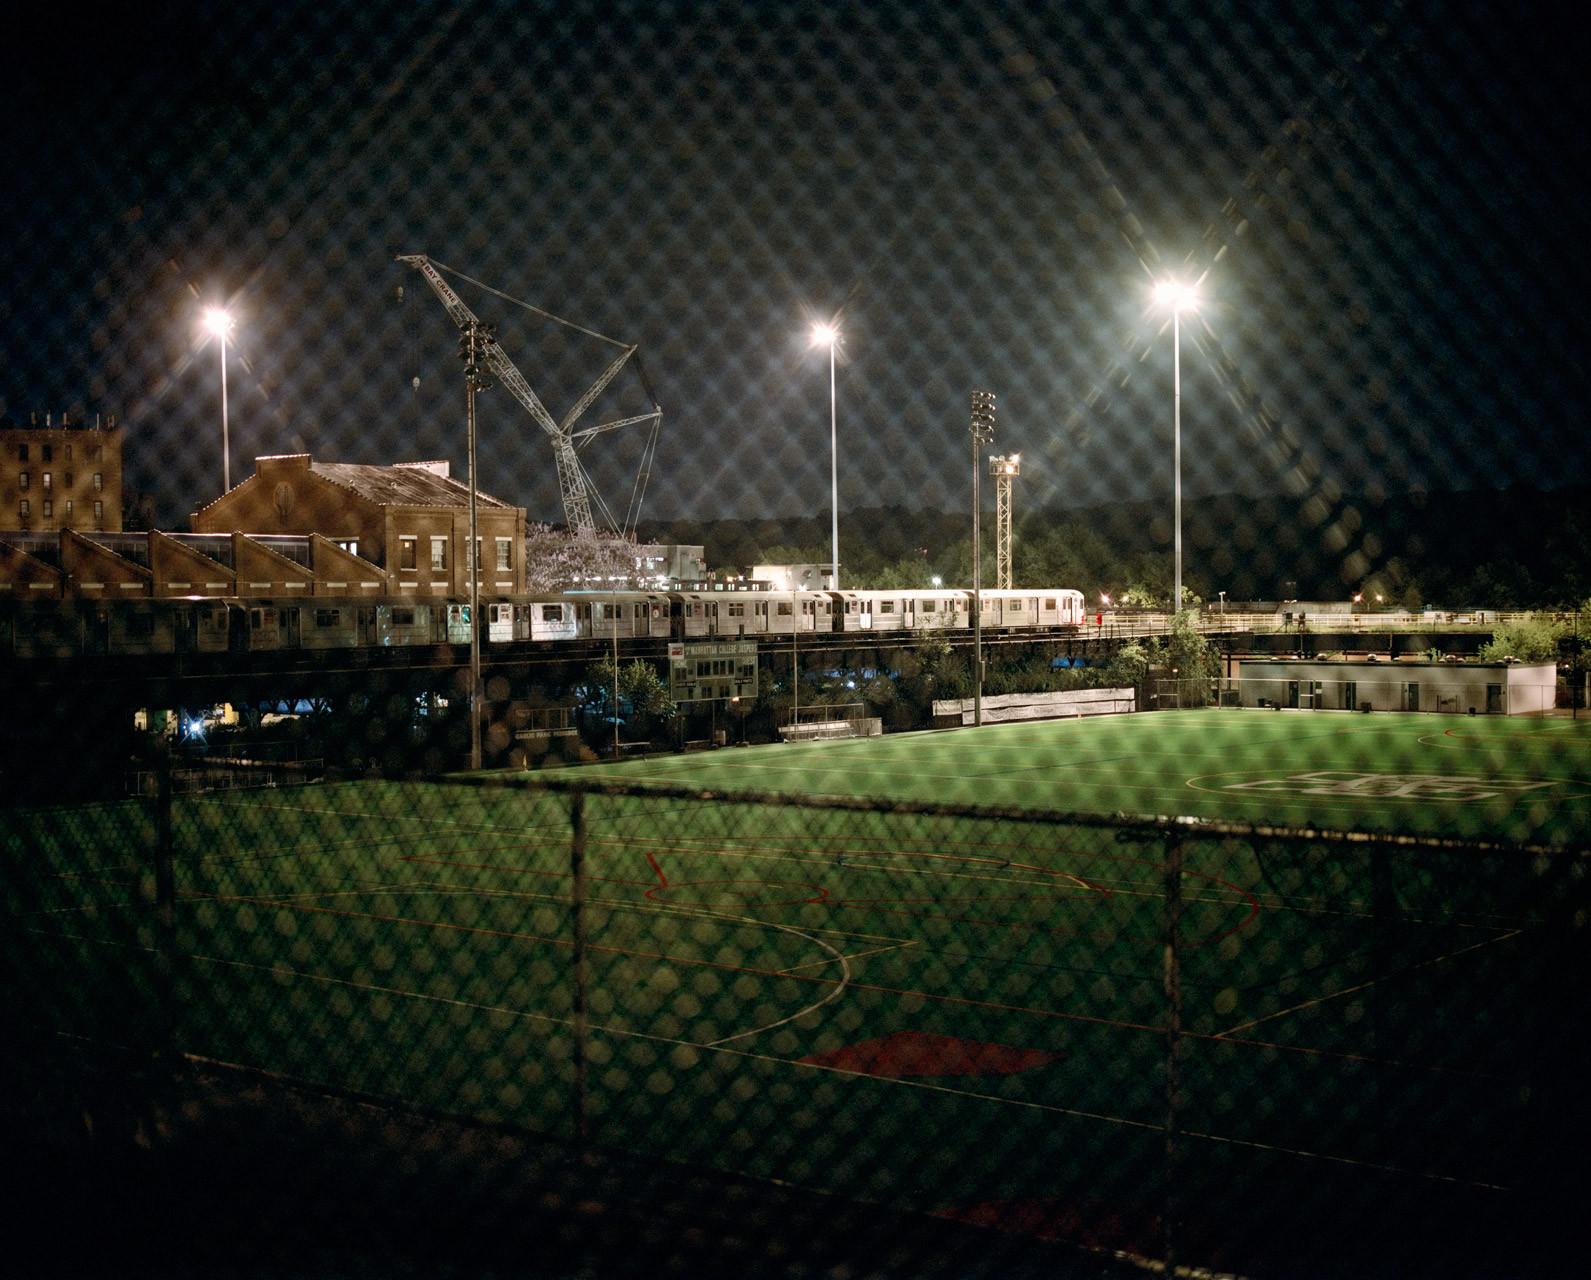 Timo_Stammberger_New_York_Bronx_Underground_Subway_Night_Citylights_Chain_Link_Fence